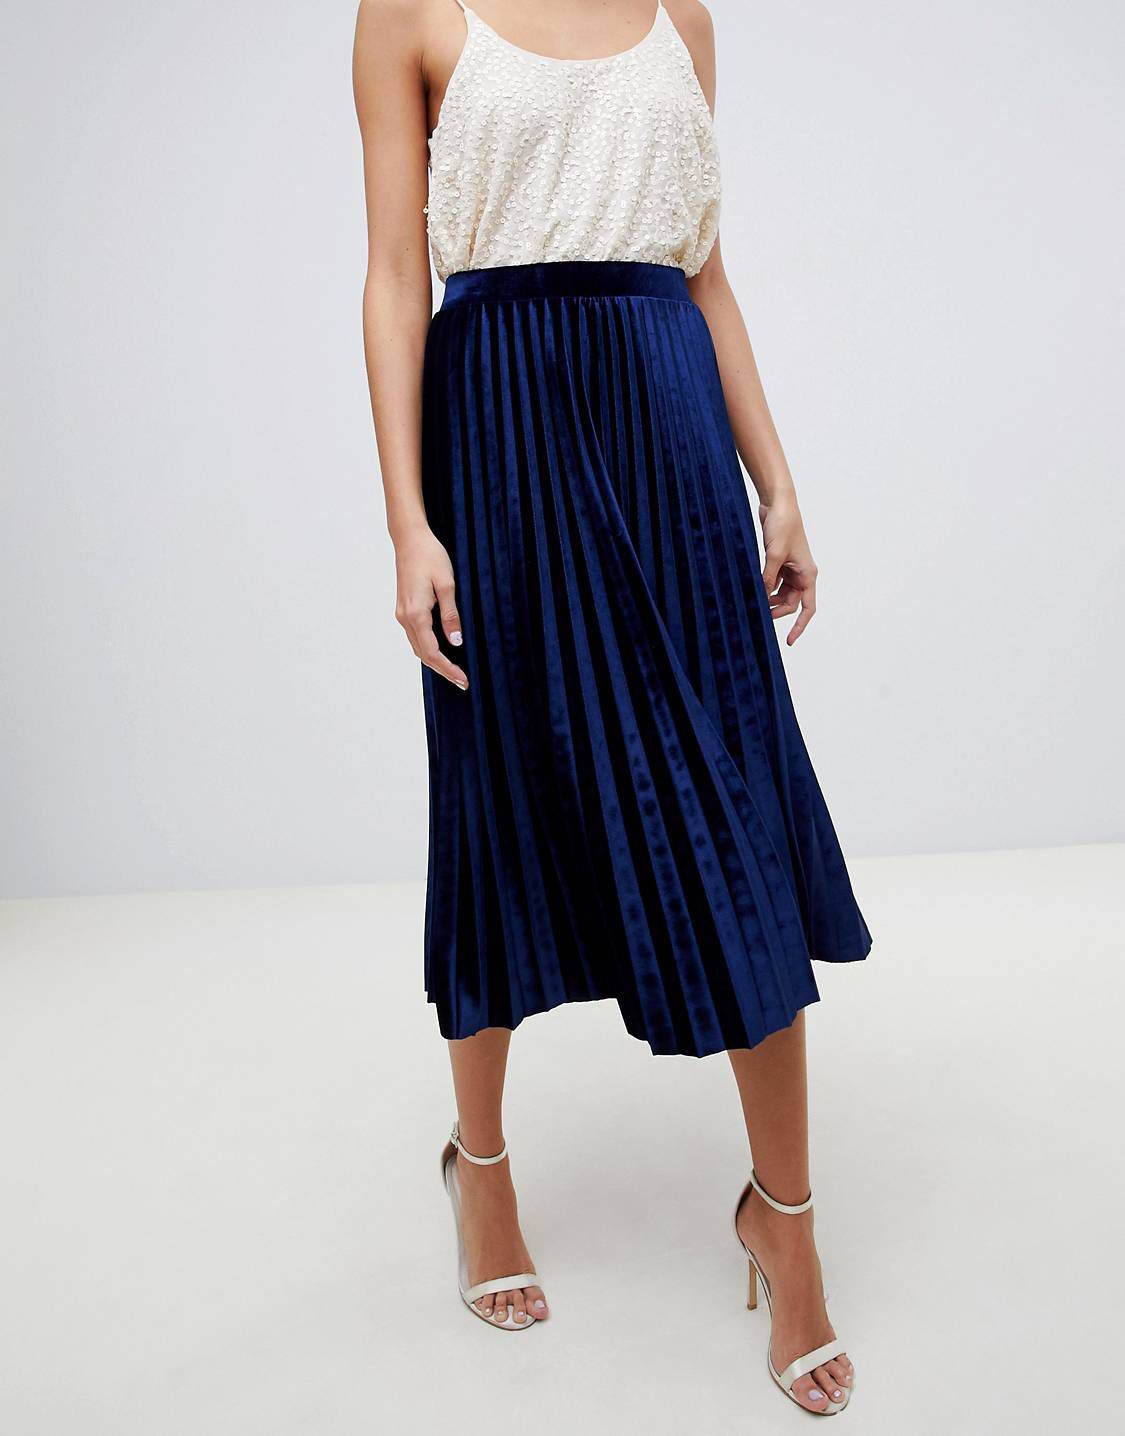 Jupe plissée bleue | Jupe plissée bleue, Jupe plissée, Jupe